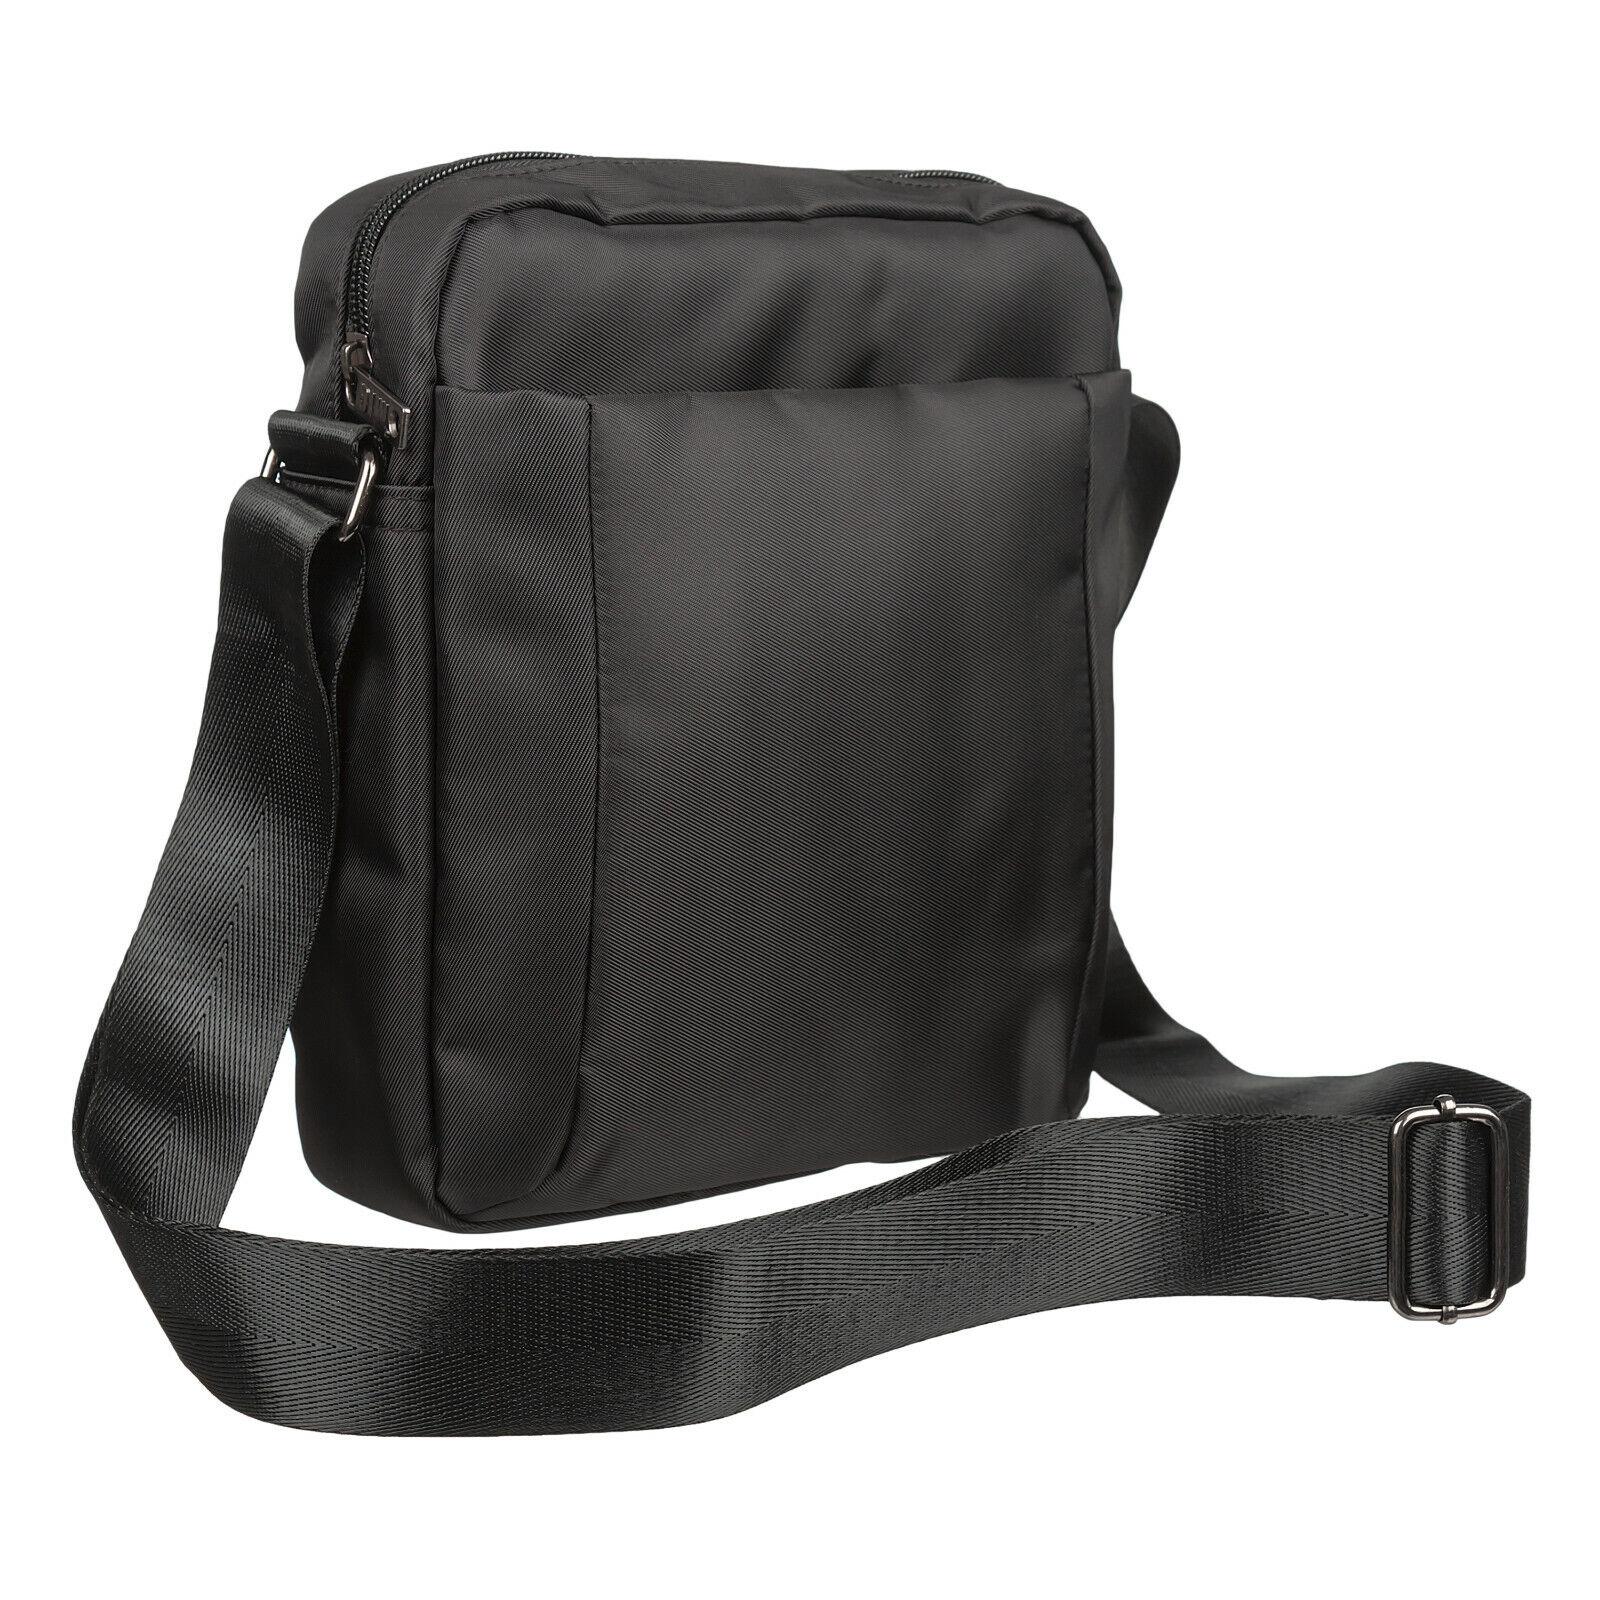 Mens Black Mini Organiser Shoulder Utility Bag for TRAVEL WO